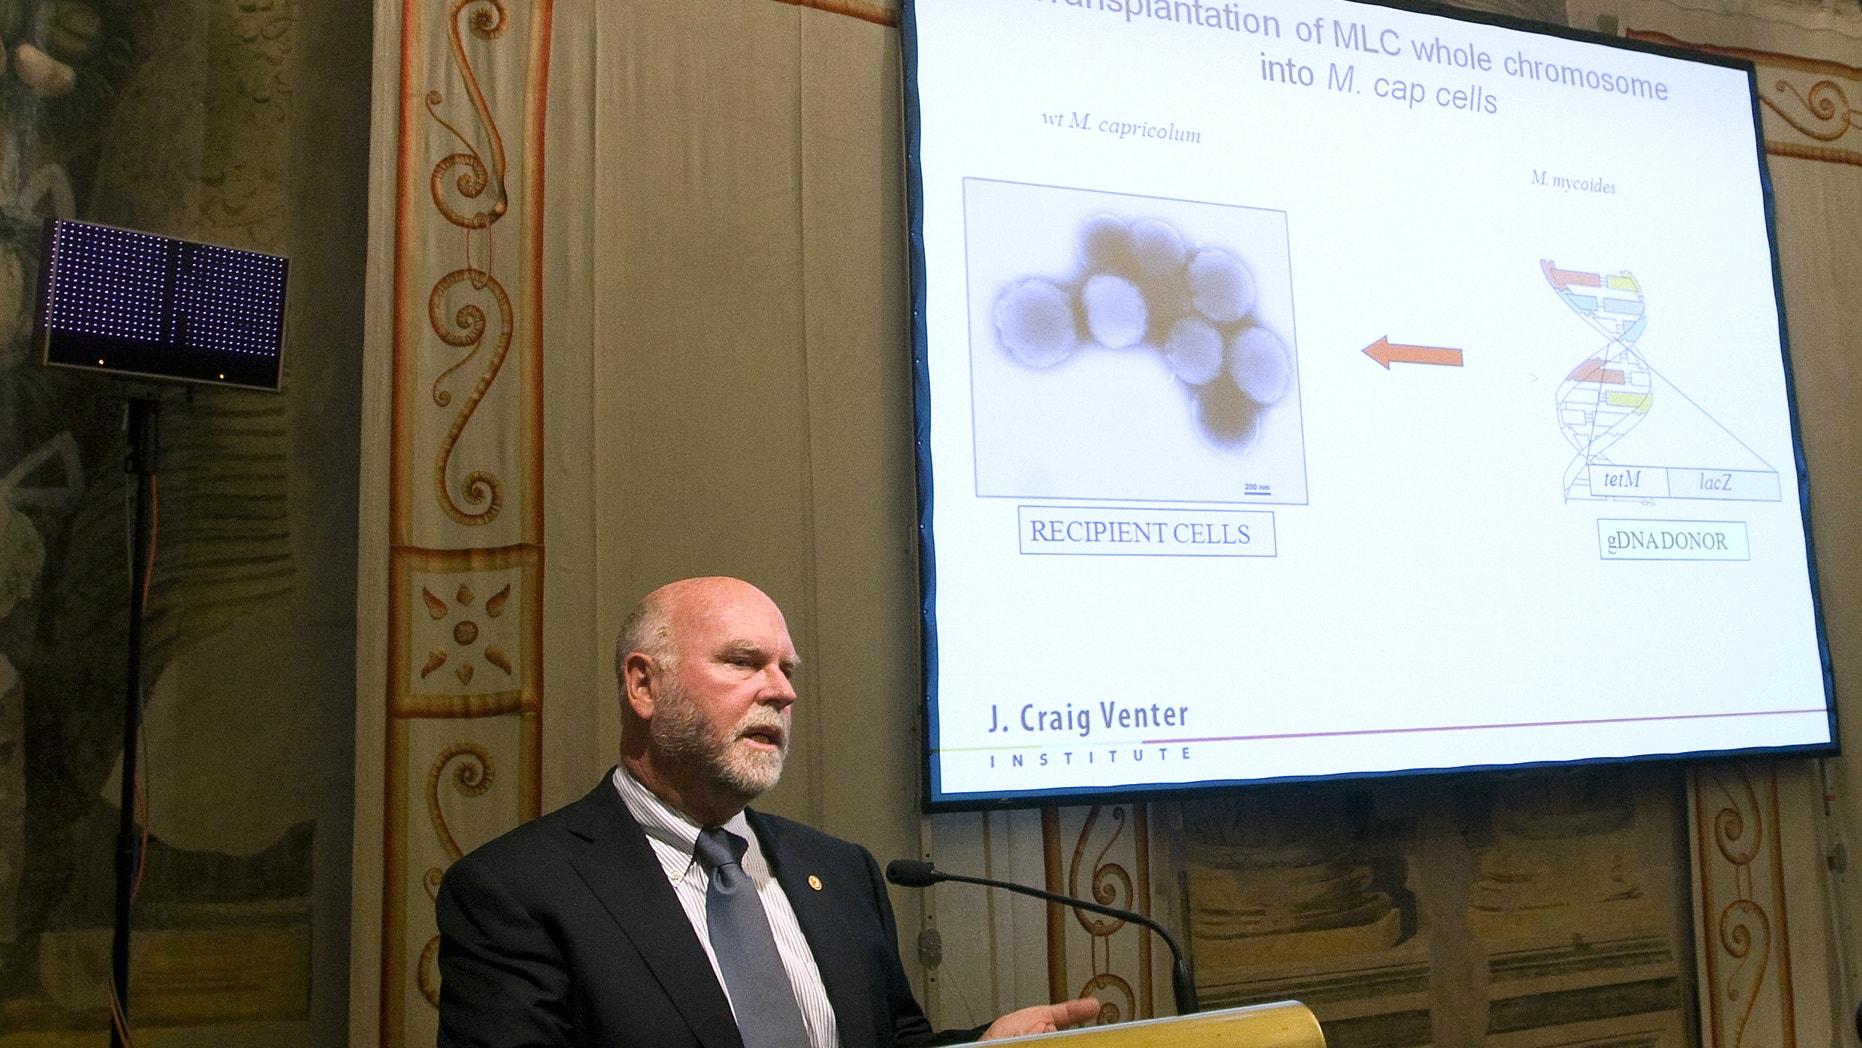 American biologist Dr. Craig Venter addresses a medical conference in Rome July 21, 2010.